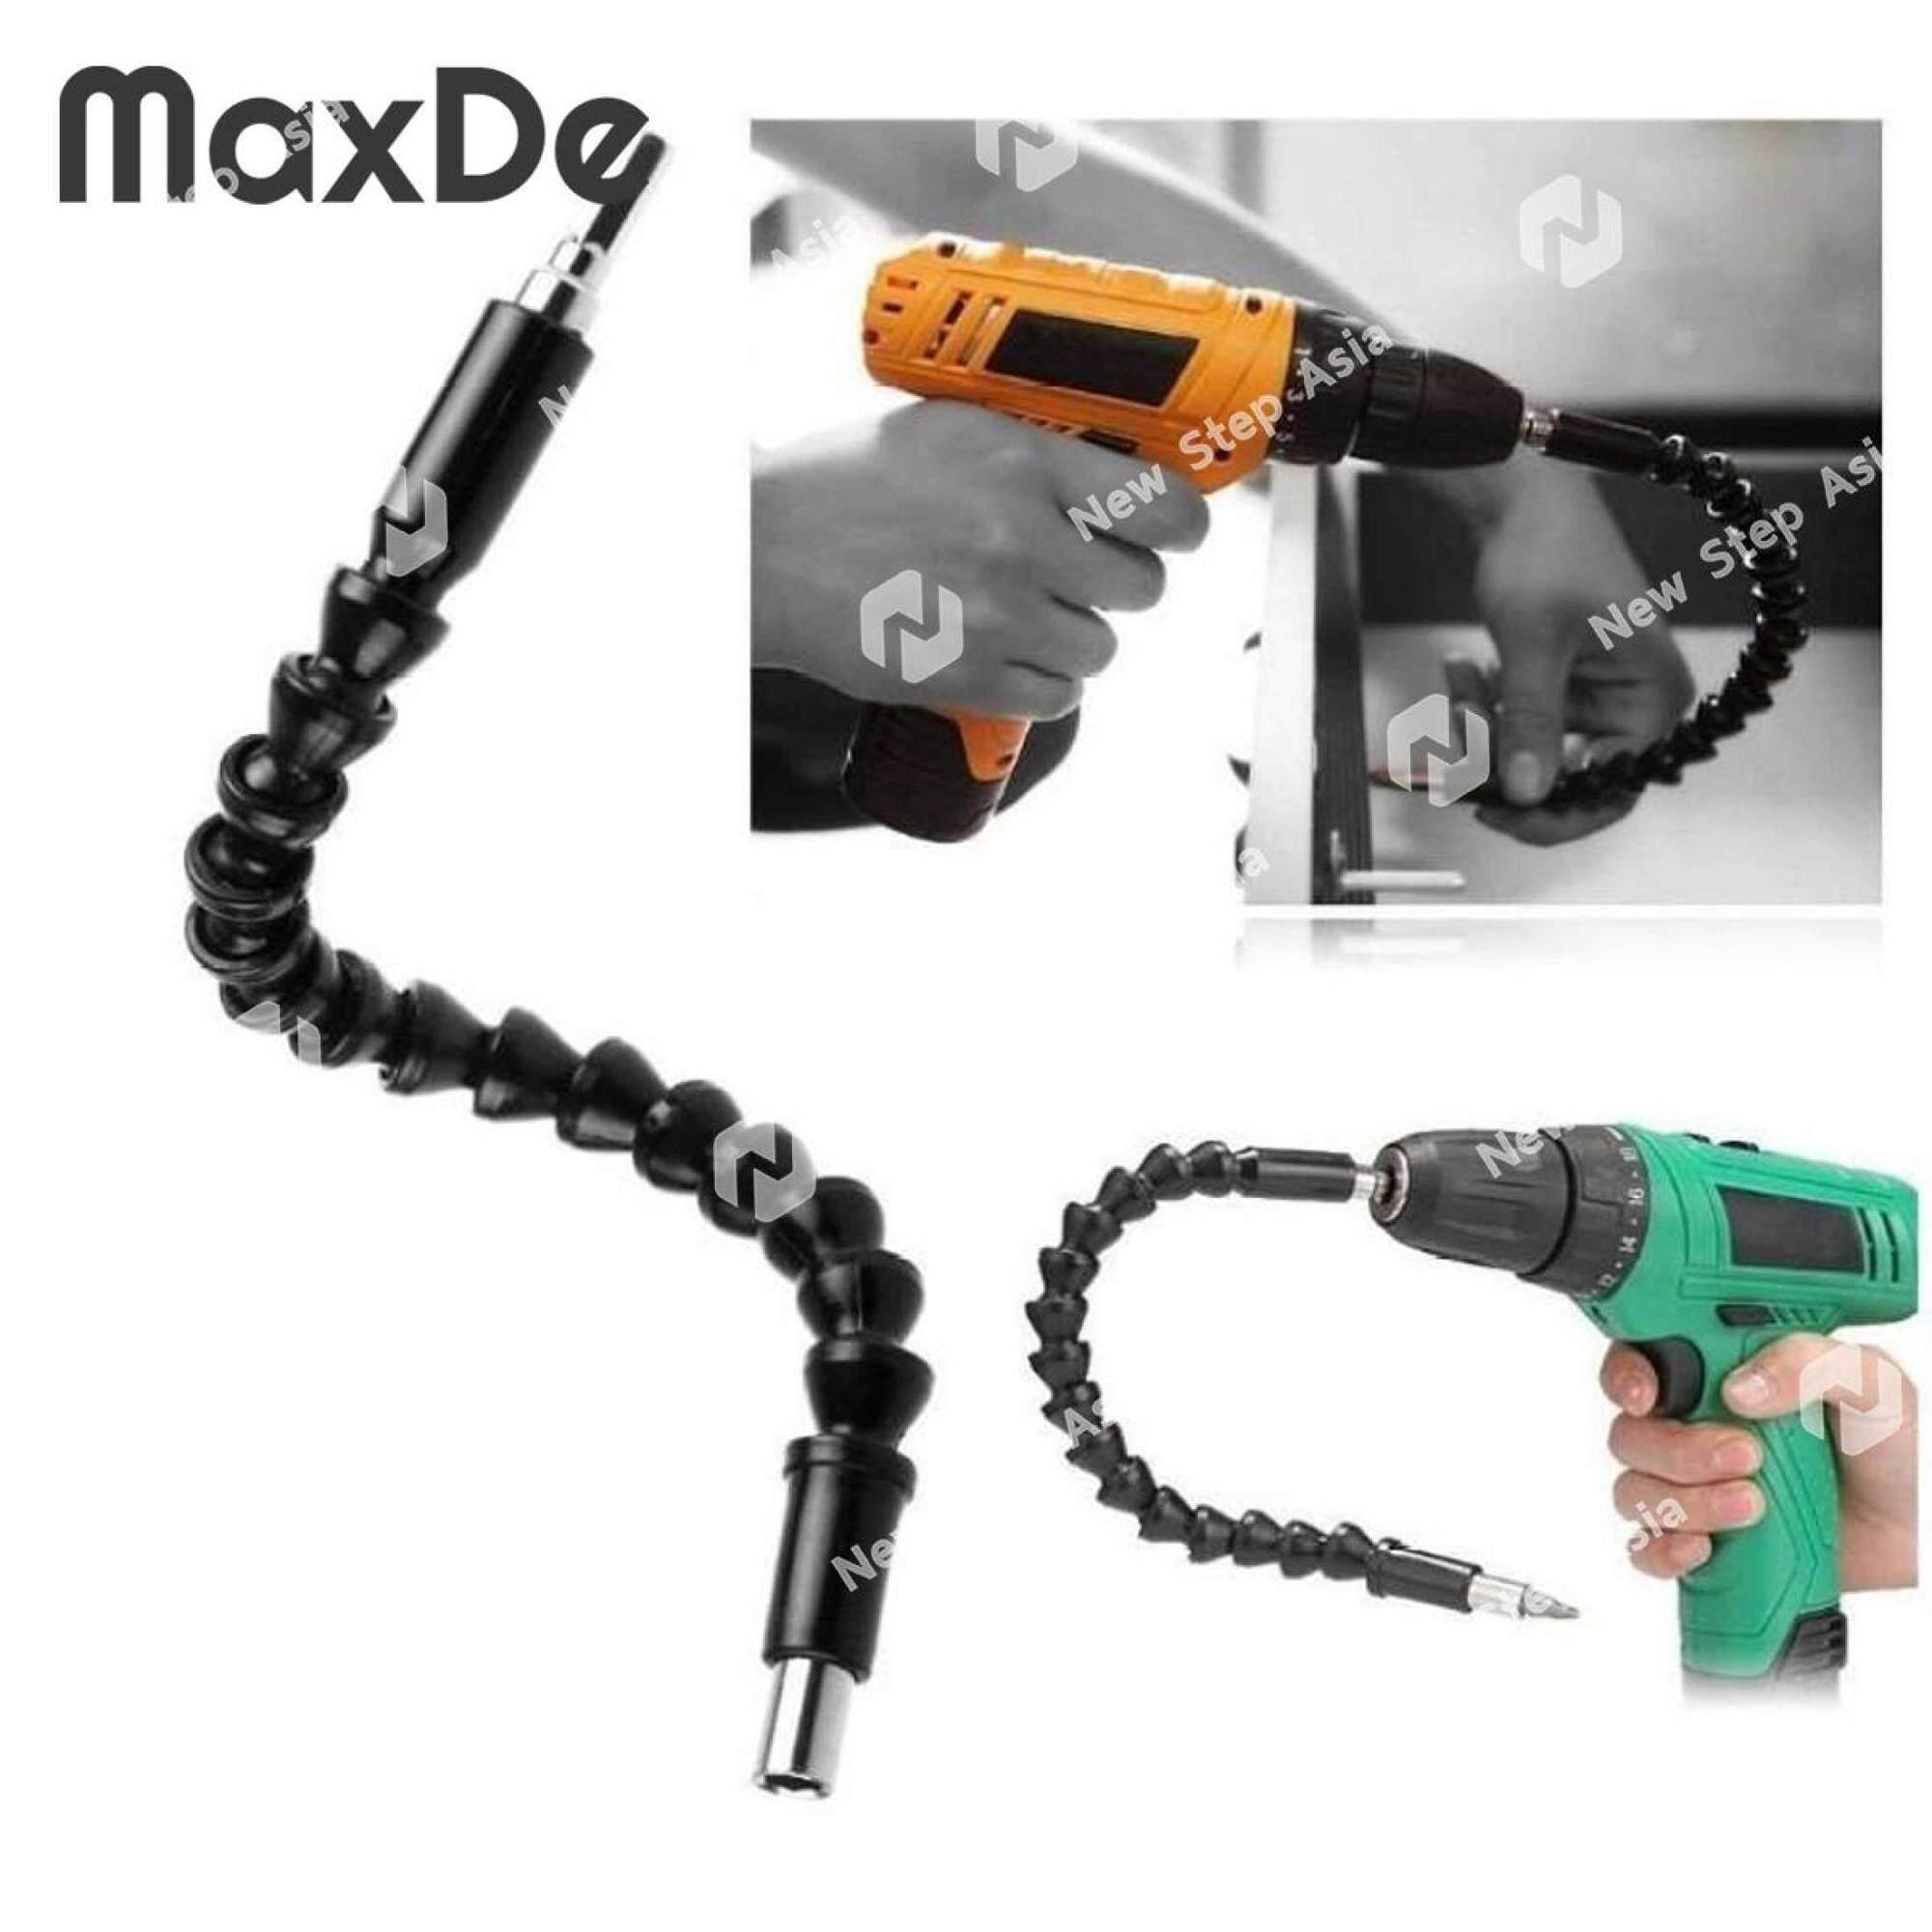 Maxde สายต่อสว่าน สายอ่อนต่อสว่าน เหมาะสำหรับขันสกรูในพื้นที่แคบ สว่านไร้สาย สว่านไฟฟ้า สว่าน ไขควงไร้สาย ไขควงไฟฟ้า Flexible Extention Screwdriver Drill Bit Holder New Step Asia.